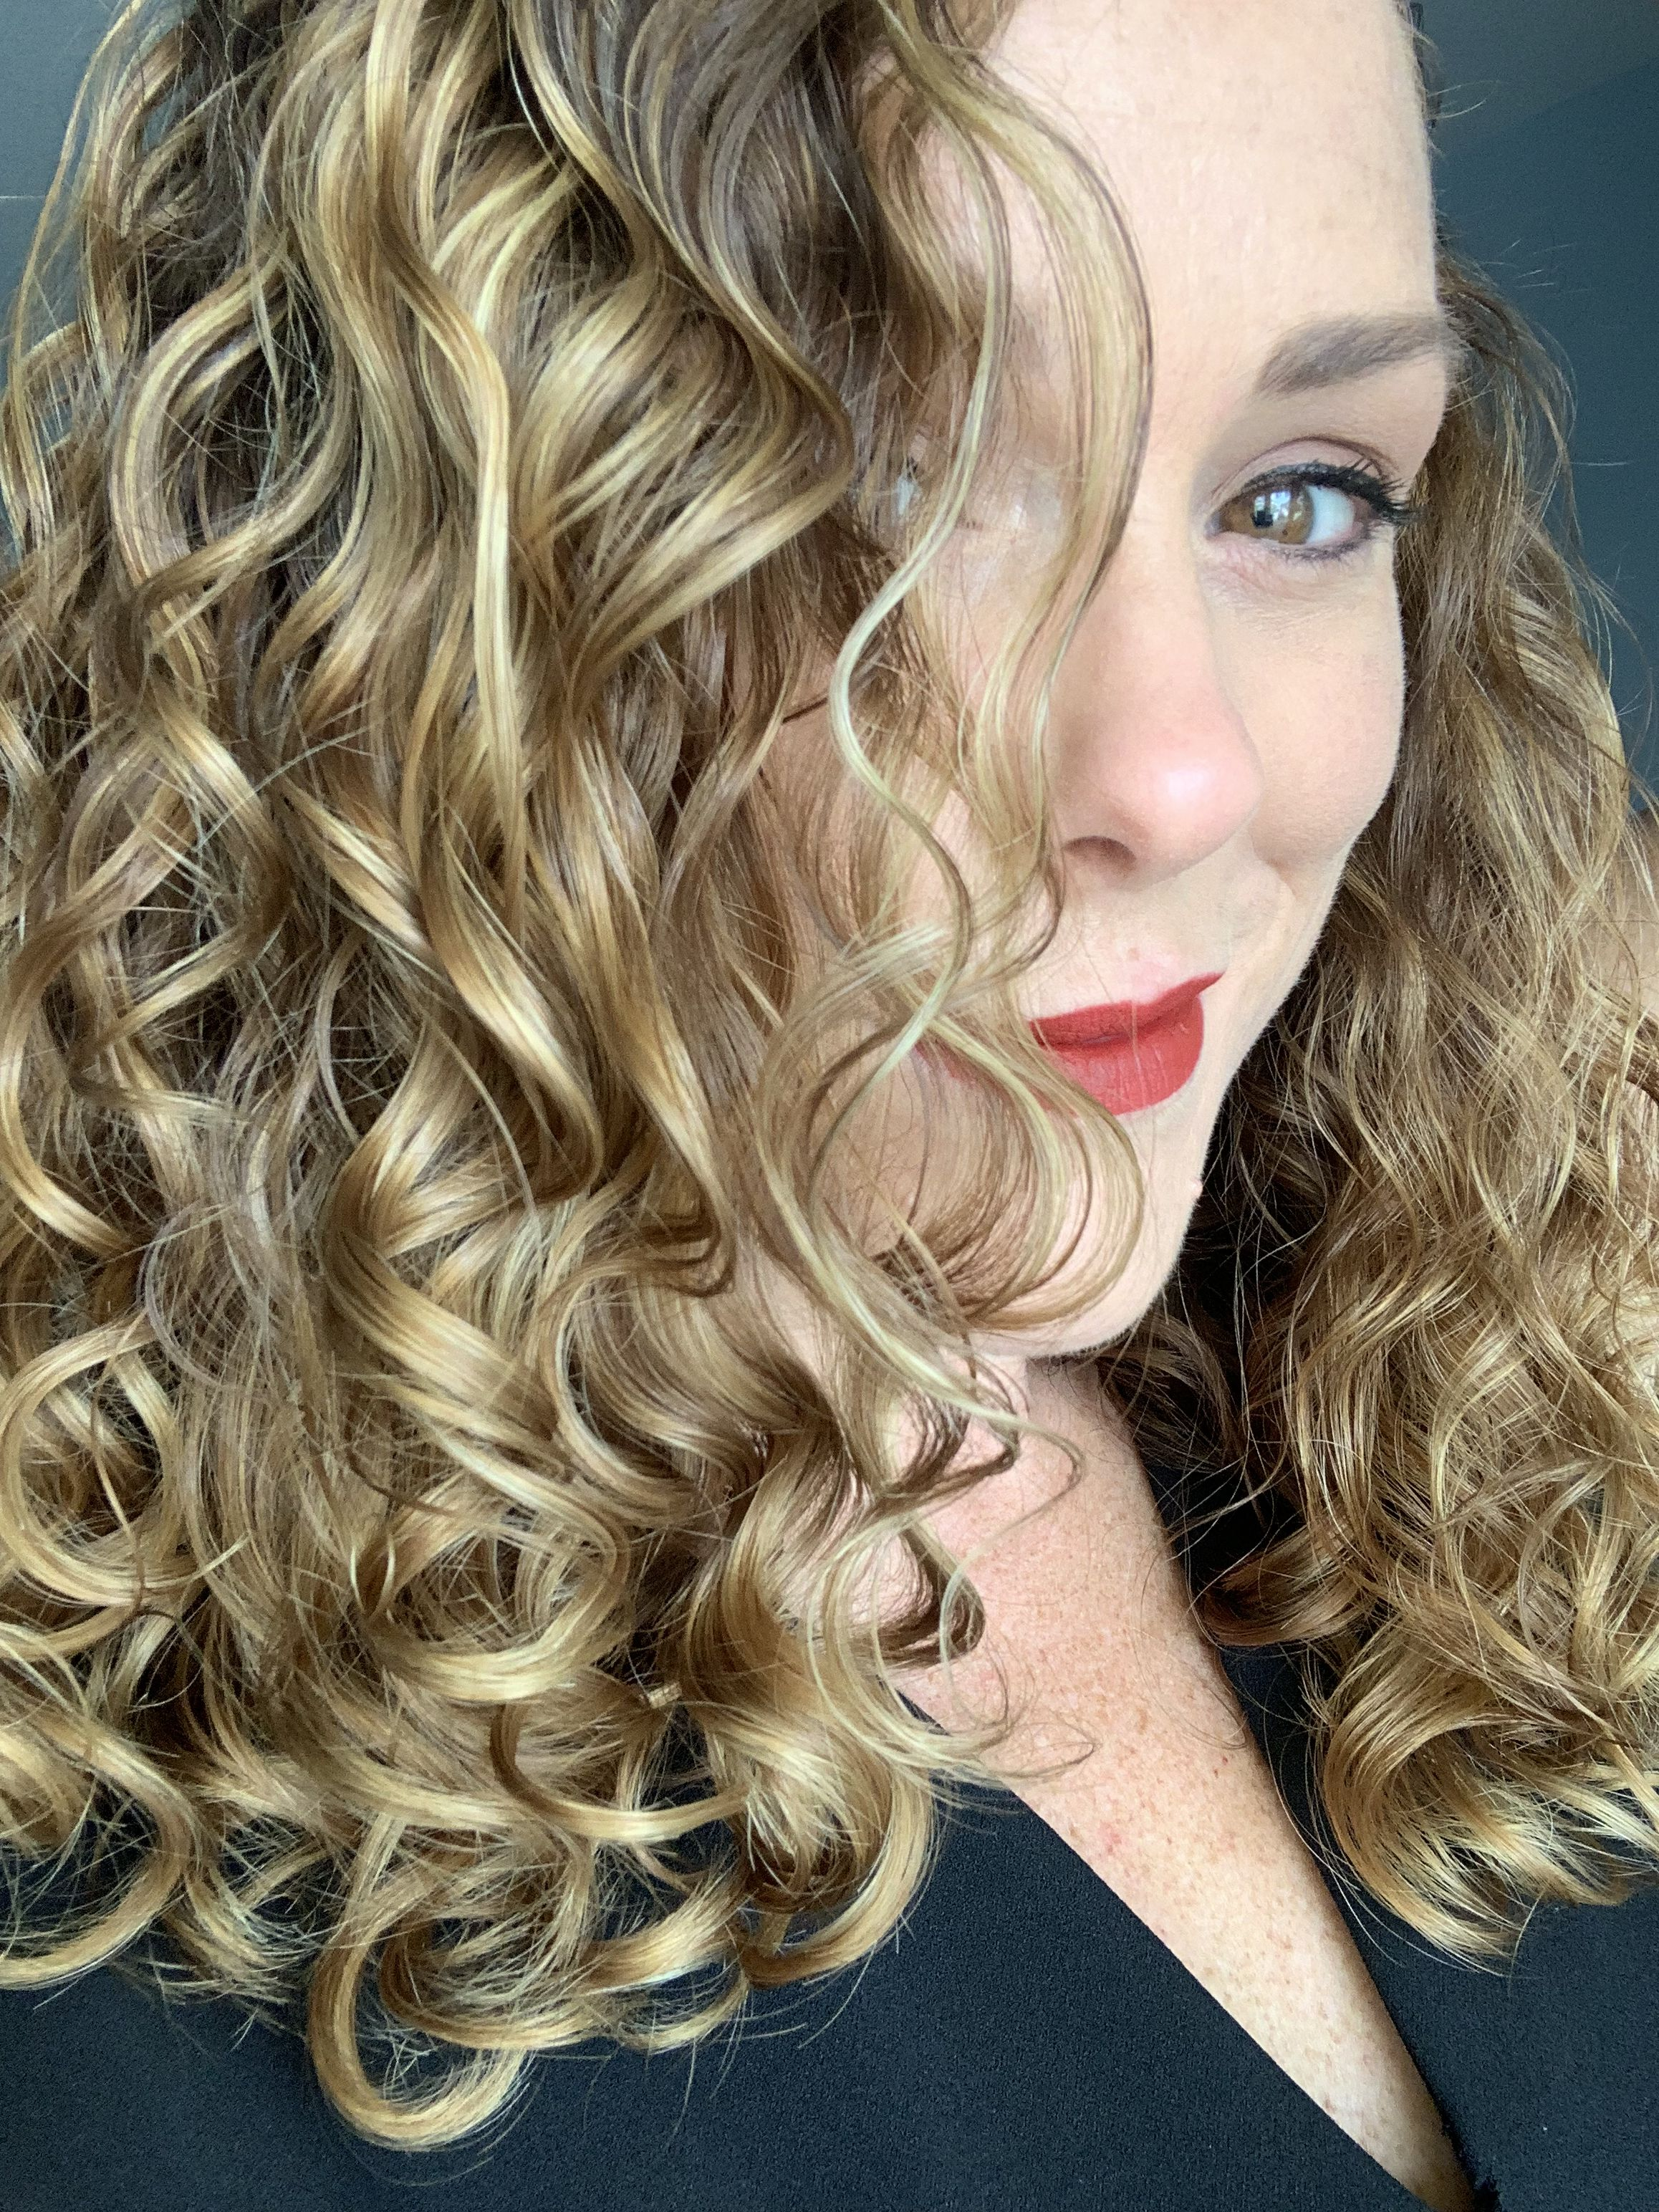 Hair Quiz In 2020 Hair Quiz Curly Hair Styles Naturally Curly Girl